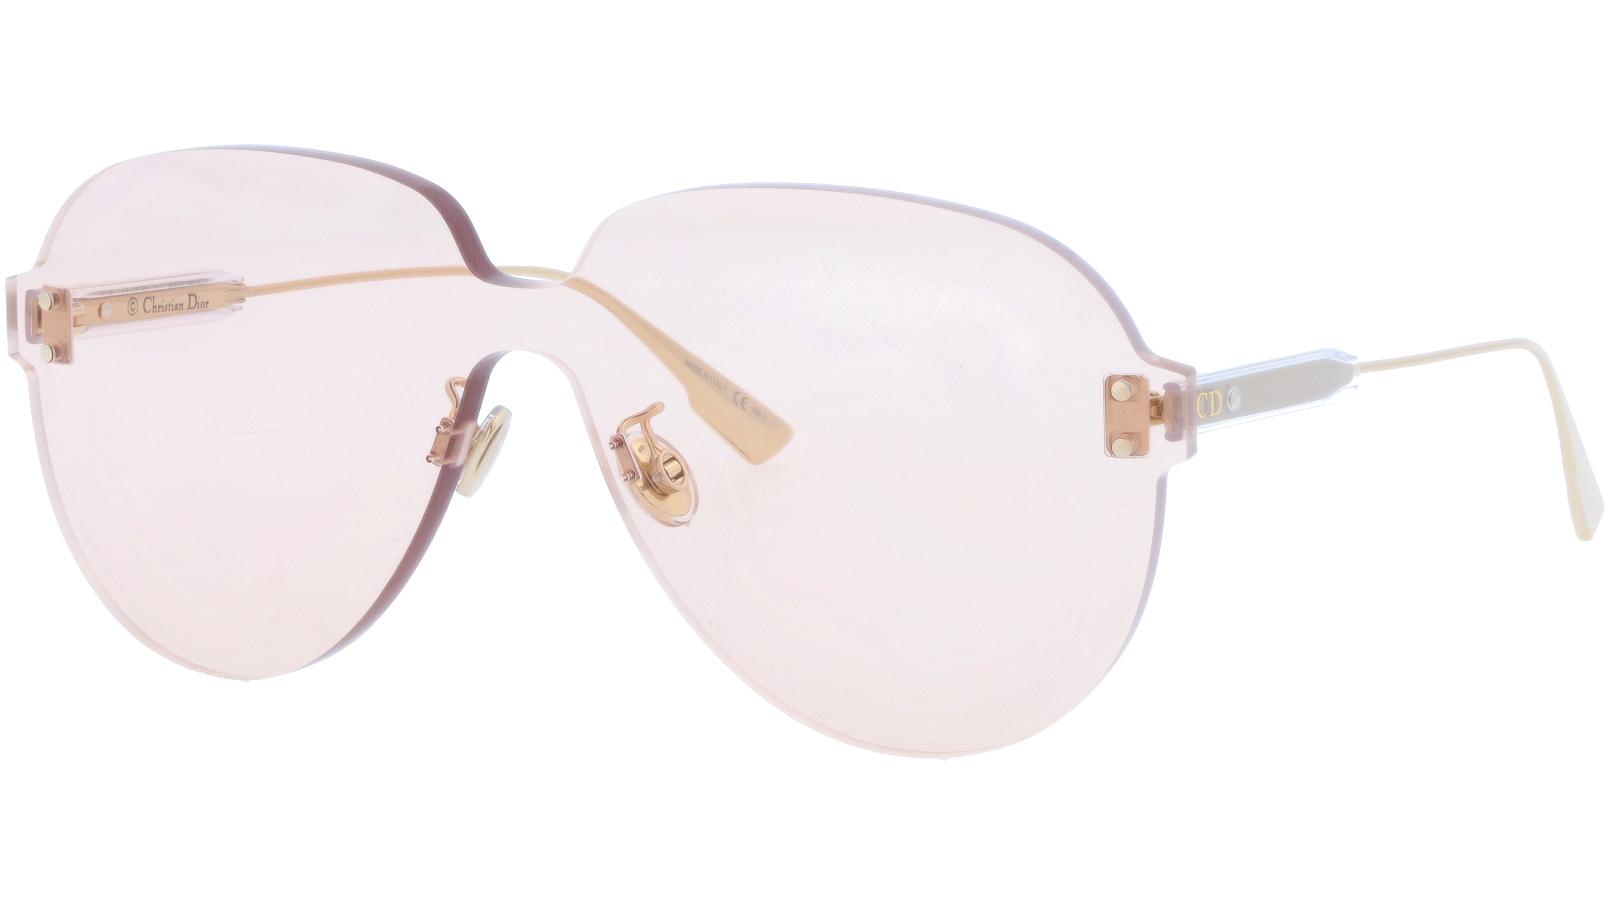 Dior COLORQUAKE3 40GHO 99 Yellow Sunglasses